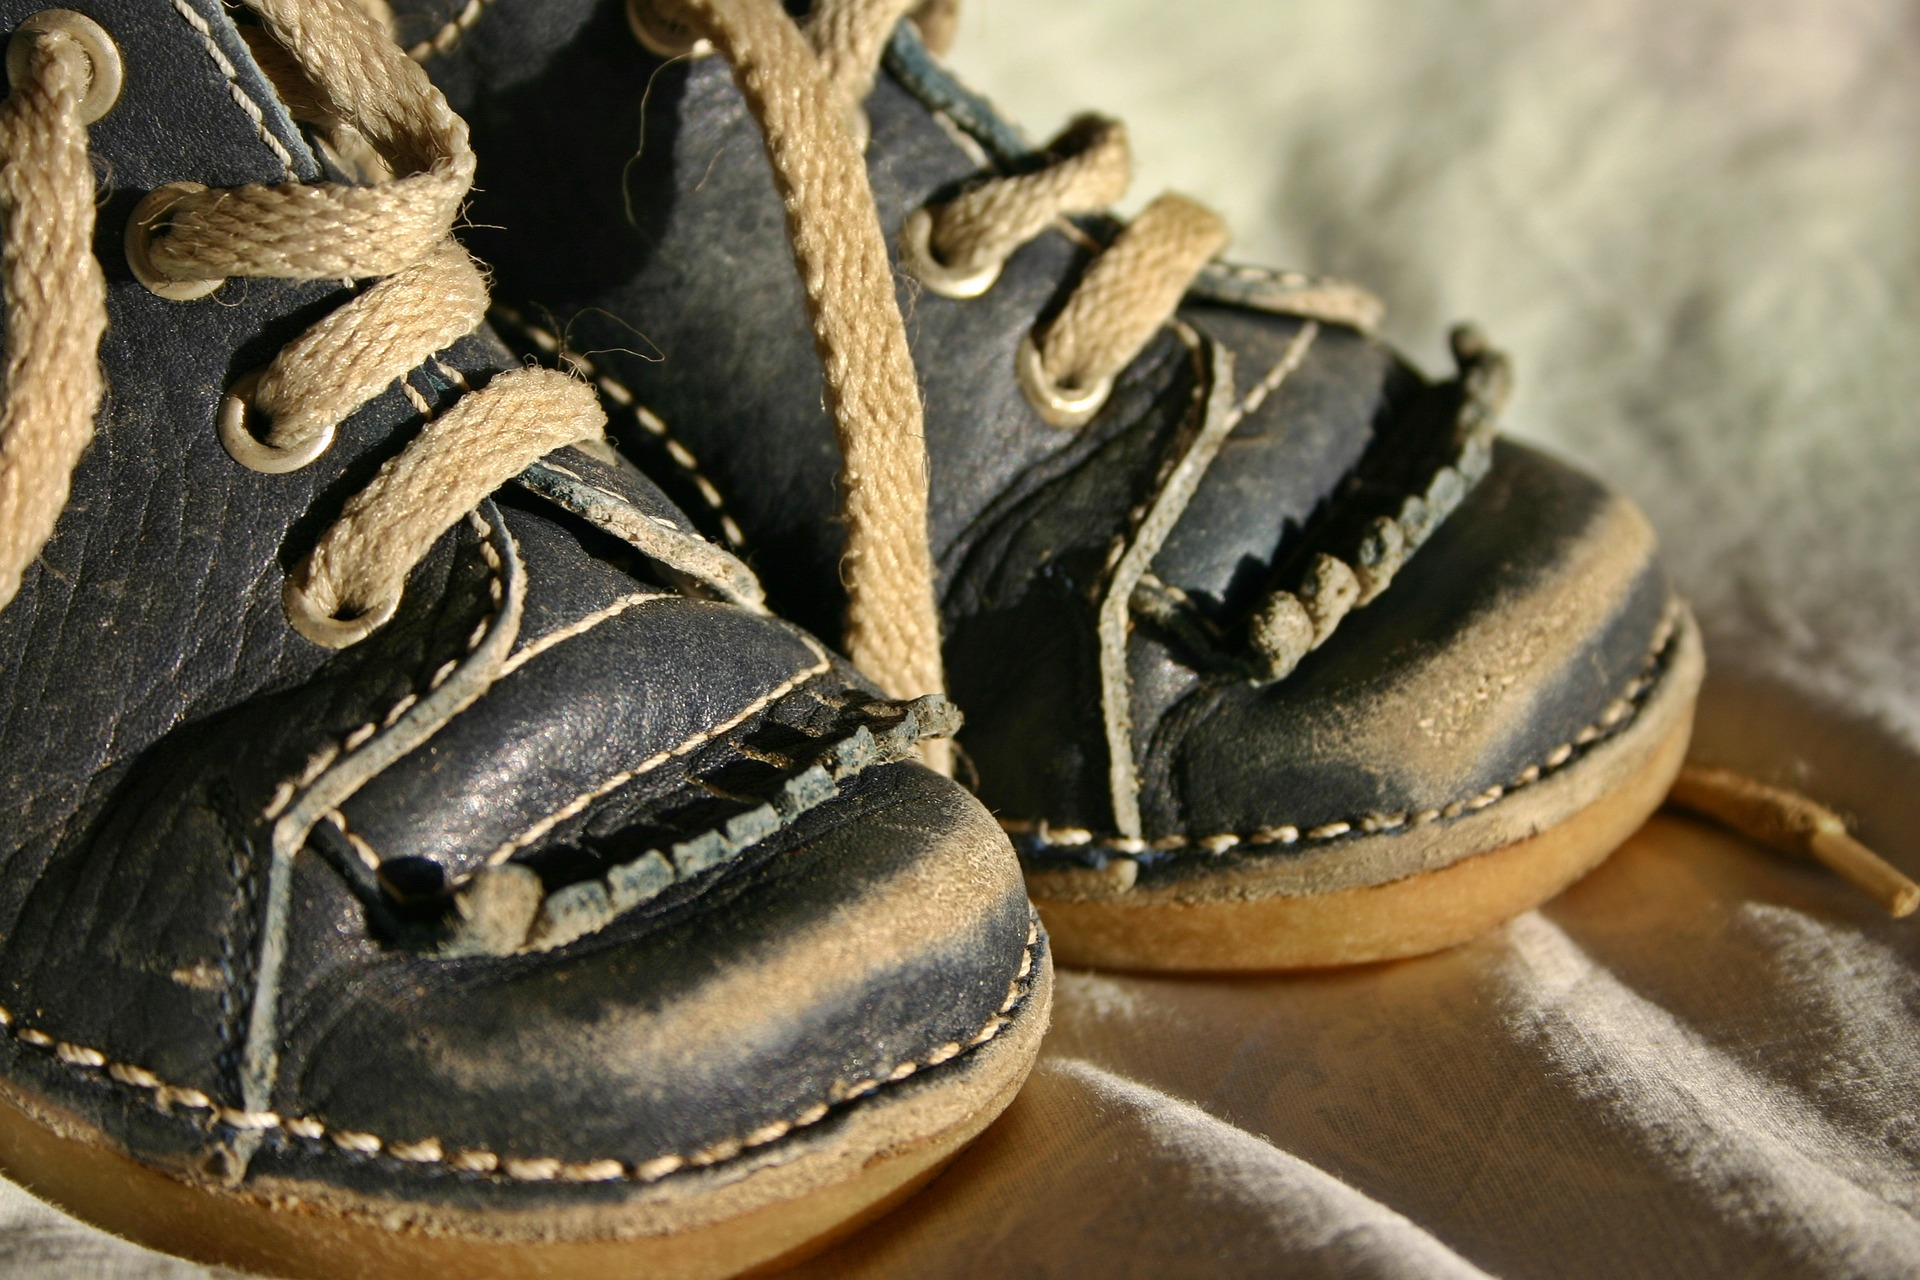 childrens-shoe-1728294_1920